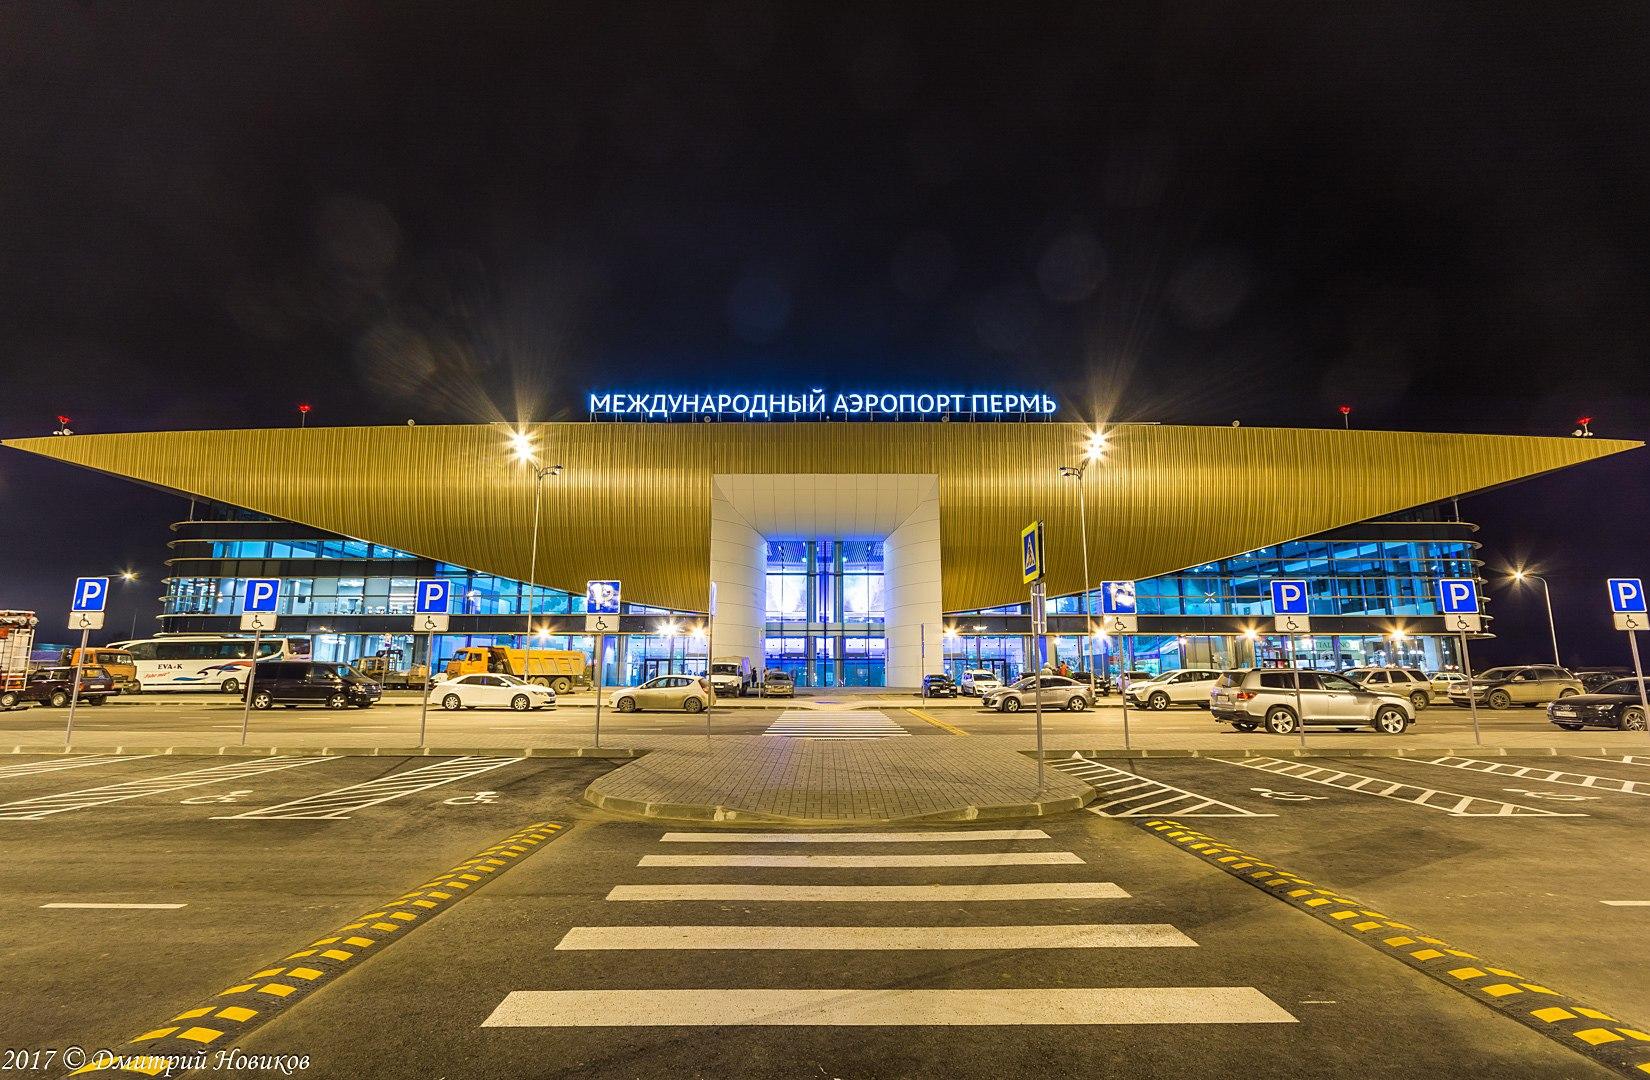 Пермскому аэропорту приостановили сертификат авиабезопасности